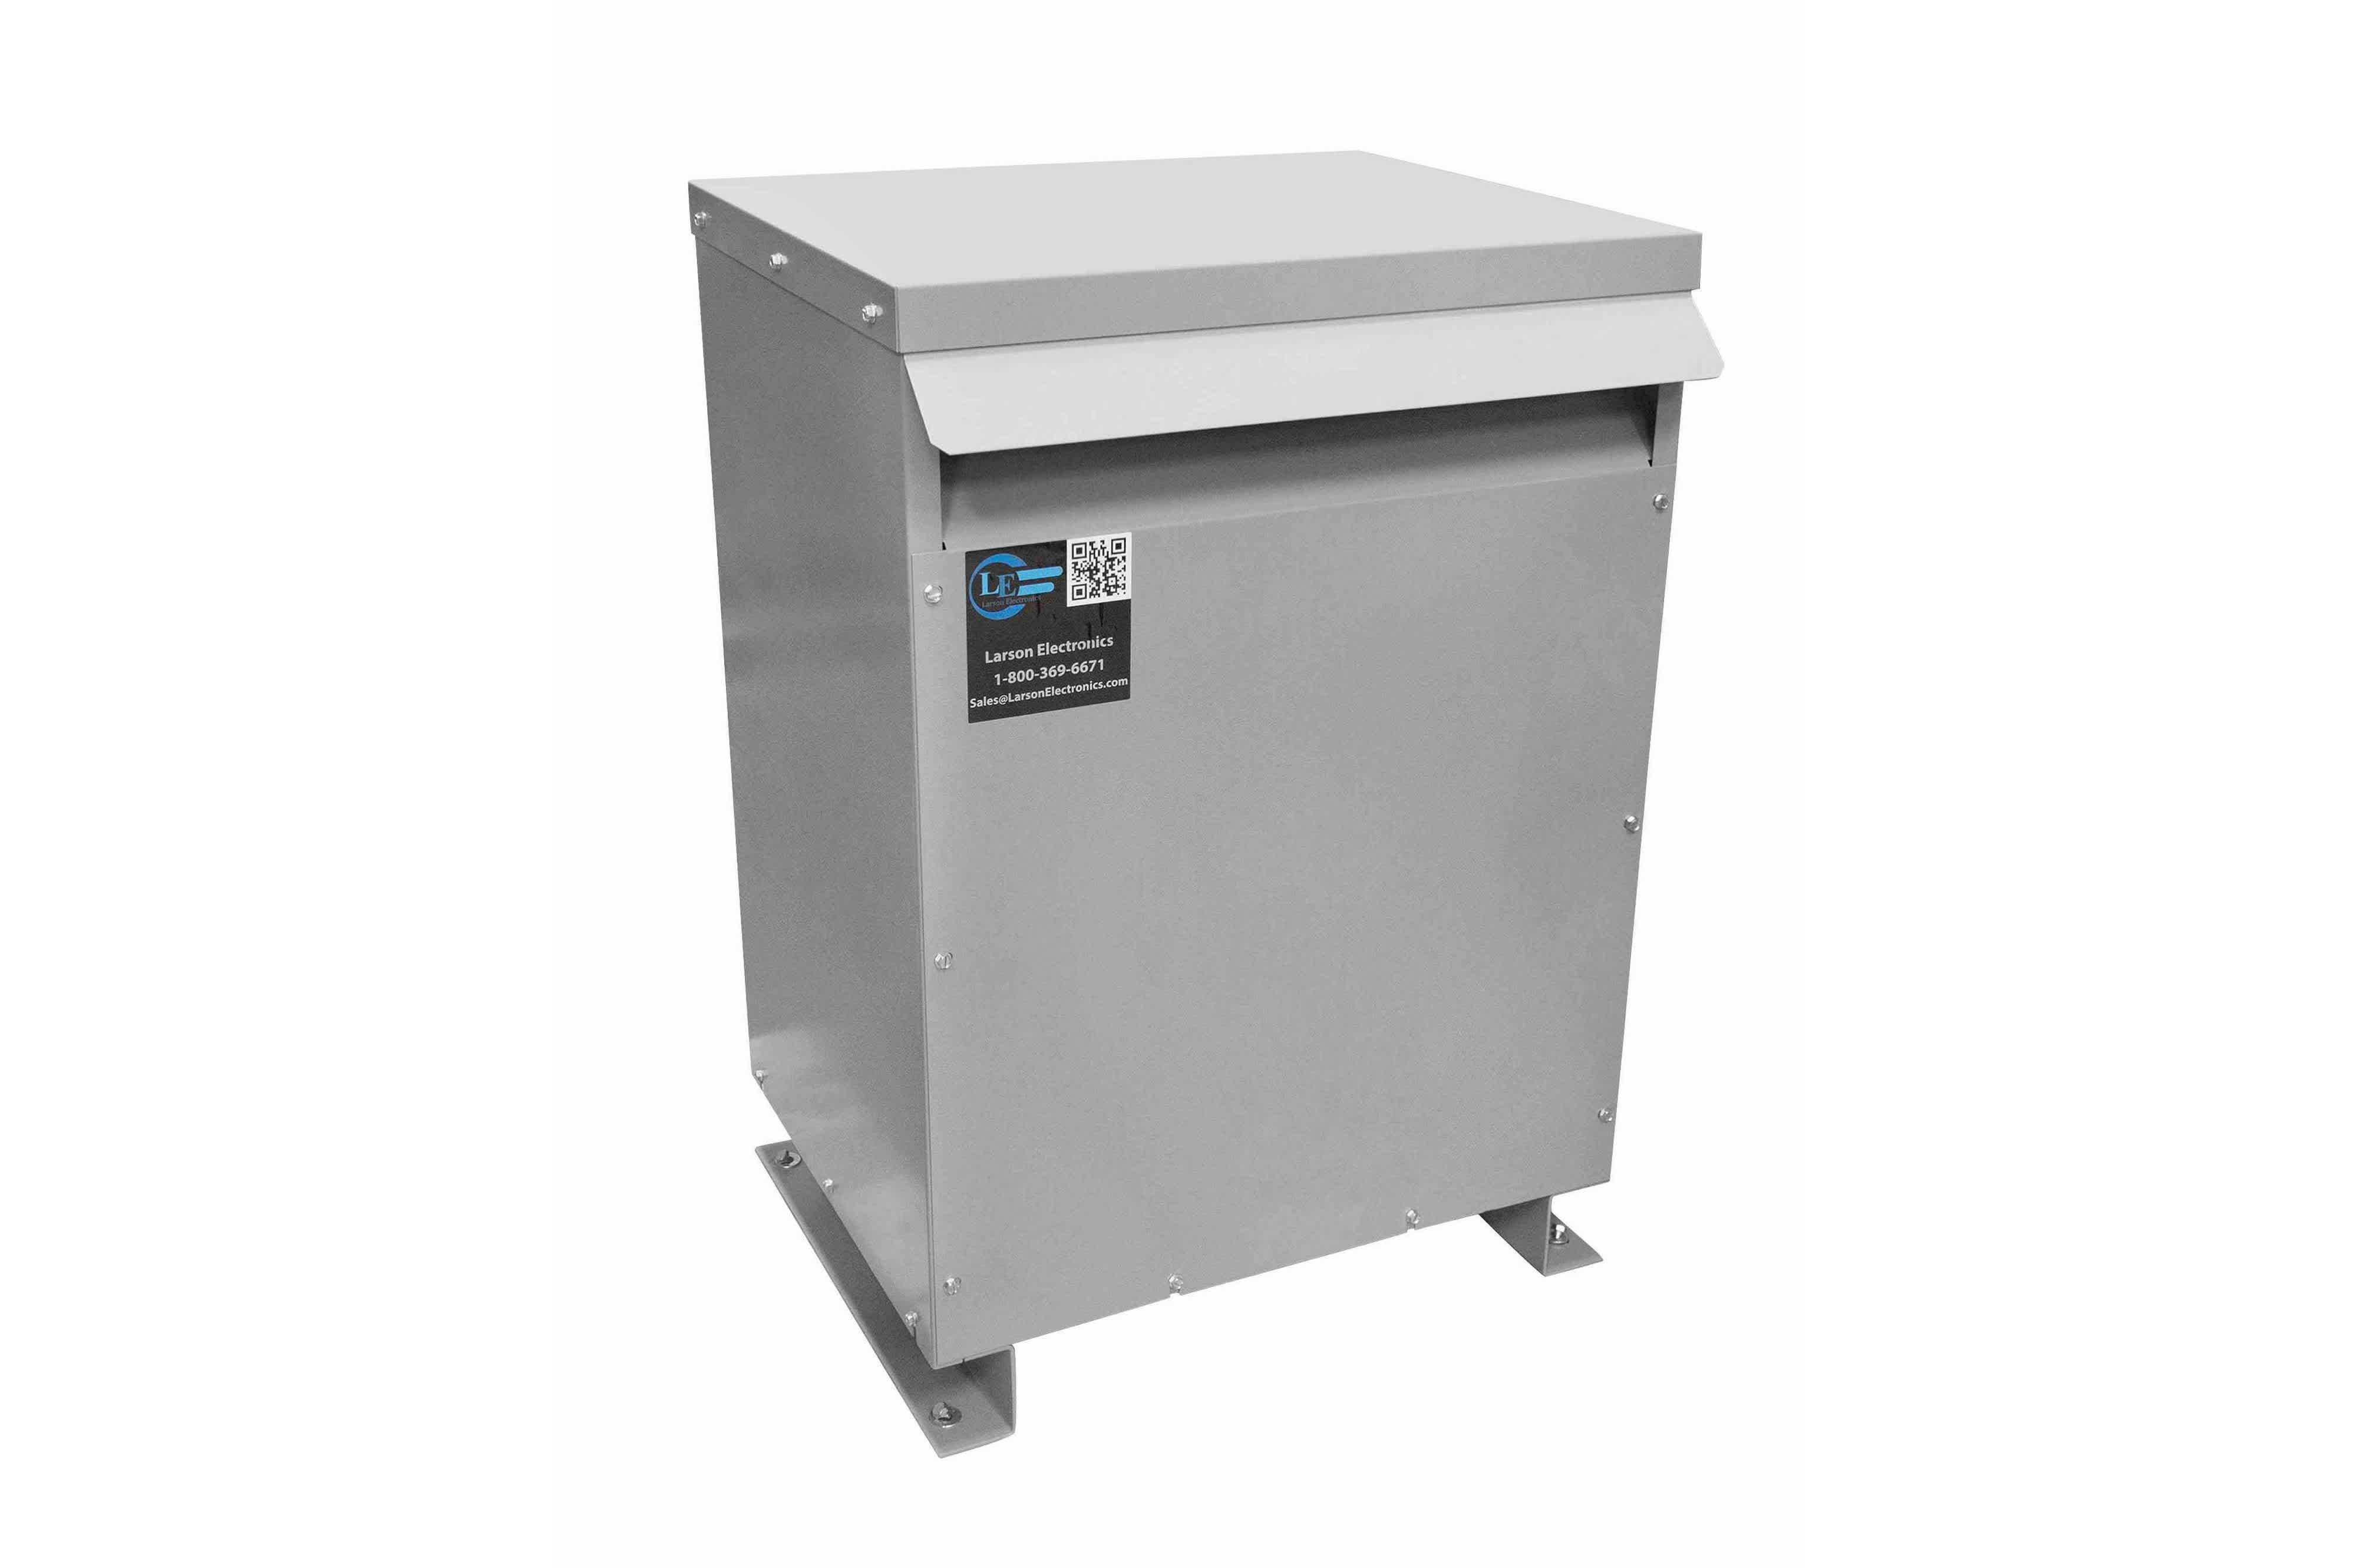 29 kVA 3PH Isolation Transformer, 220V Wye Primary, 480V Delta Secondary, N3R, Ventilated, 60 Hz